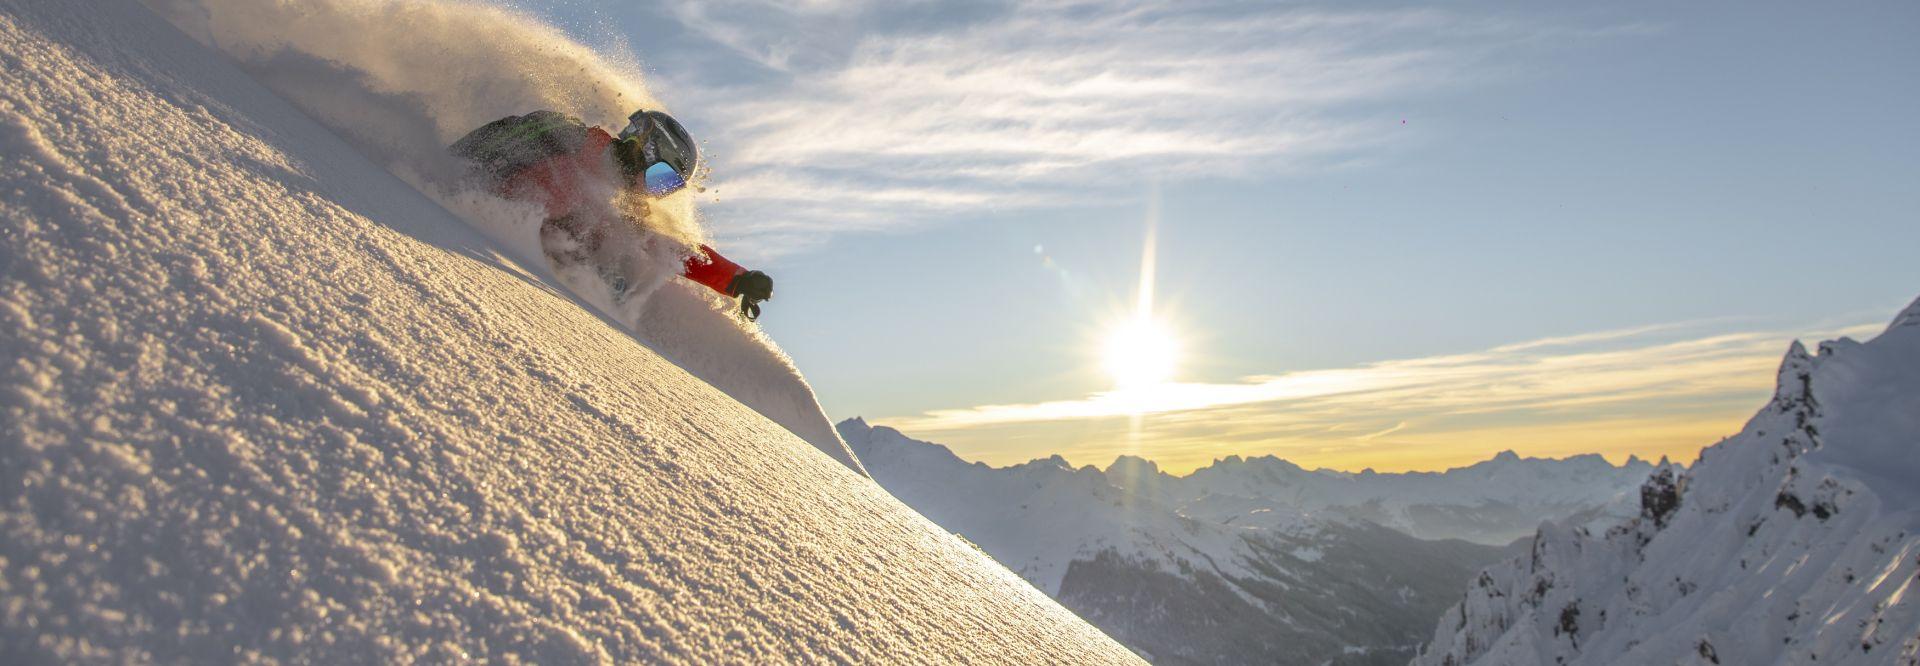 Skifahren off Piste (c) Arlberger Bergbahnen (Ski Arlberg)